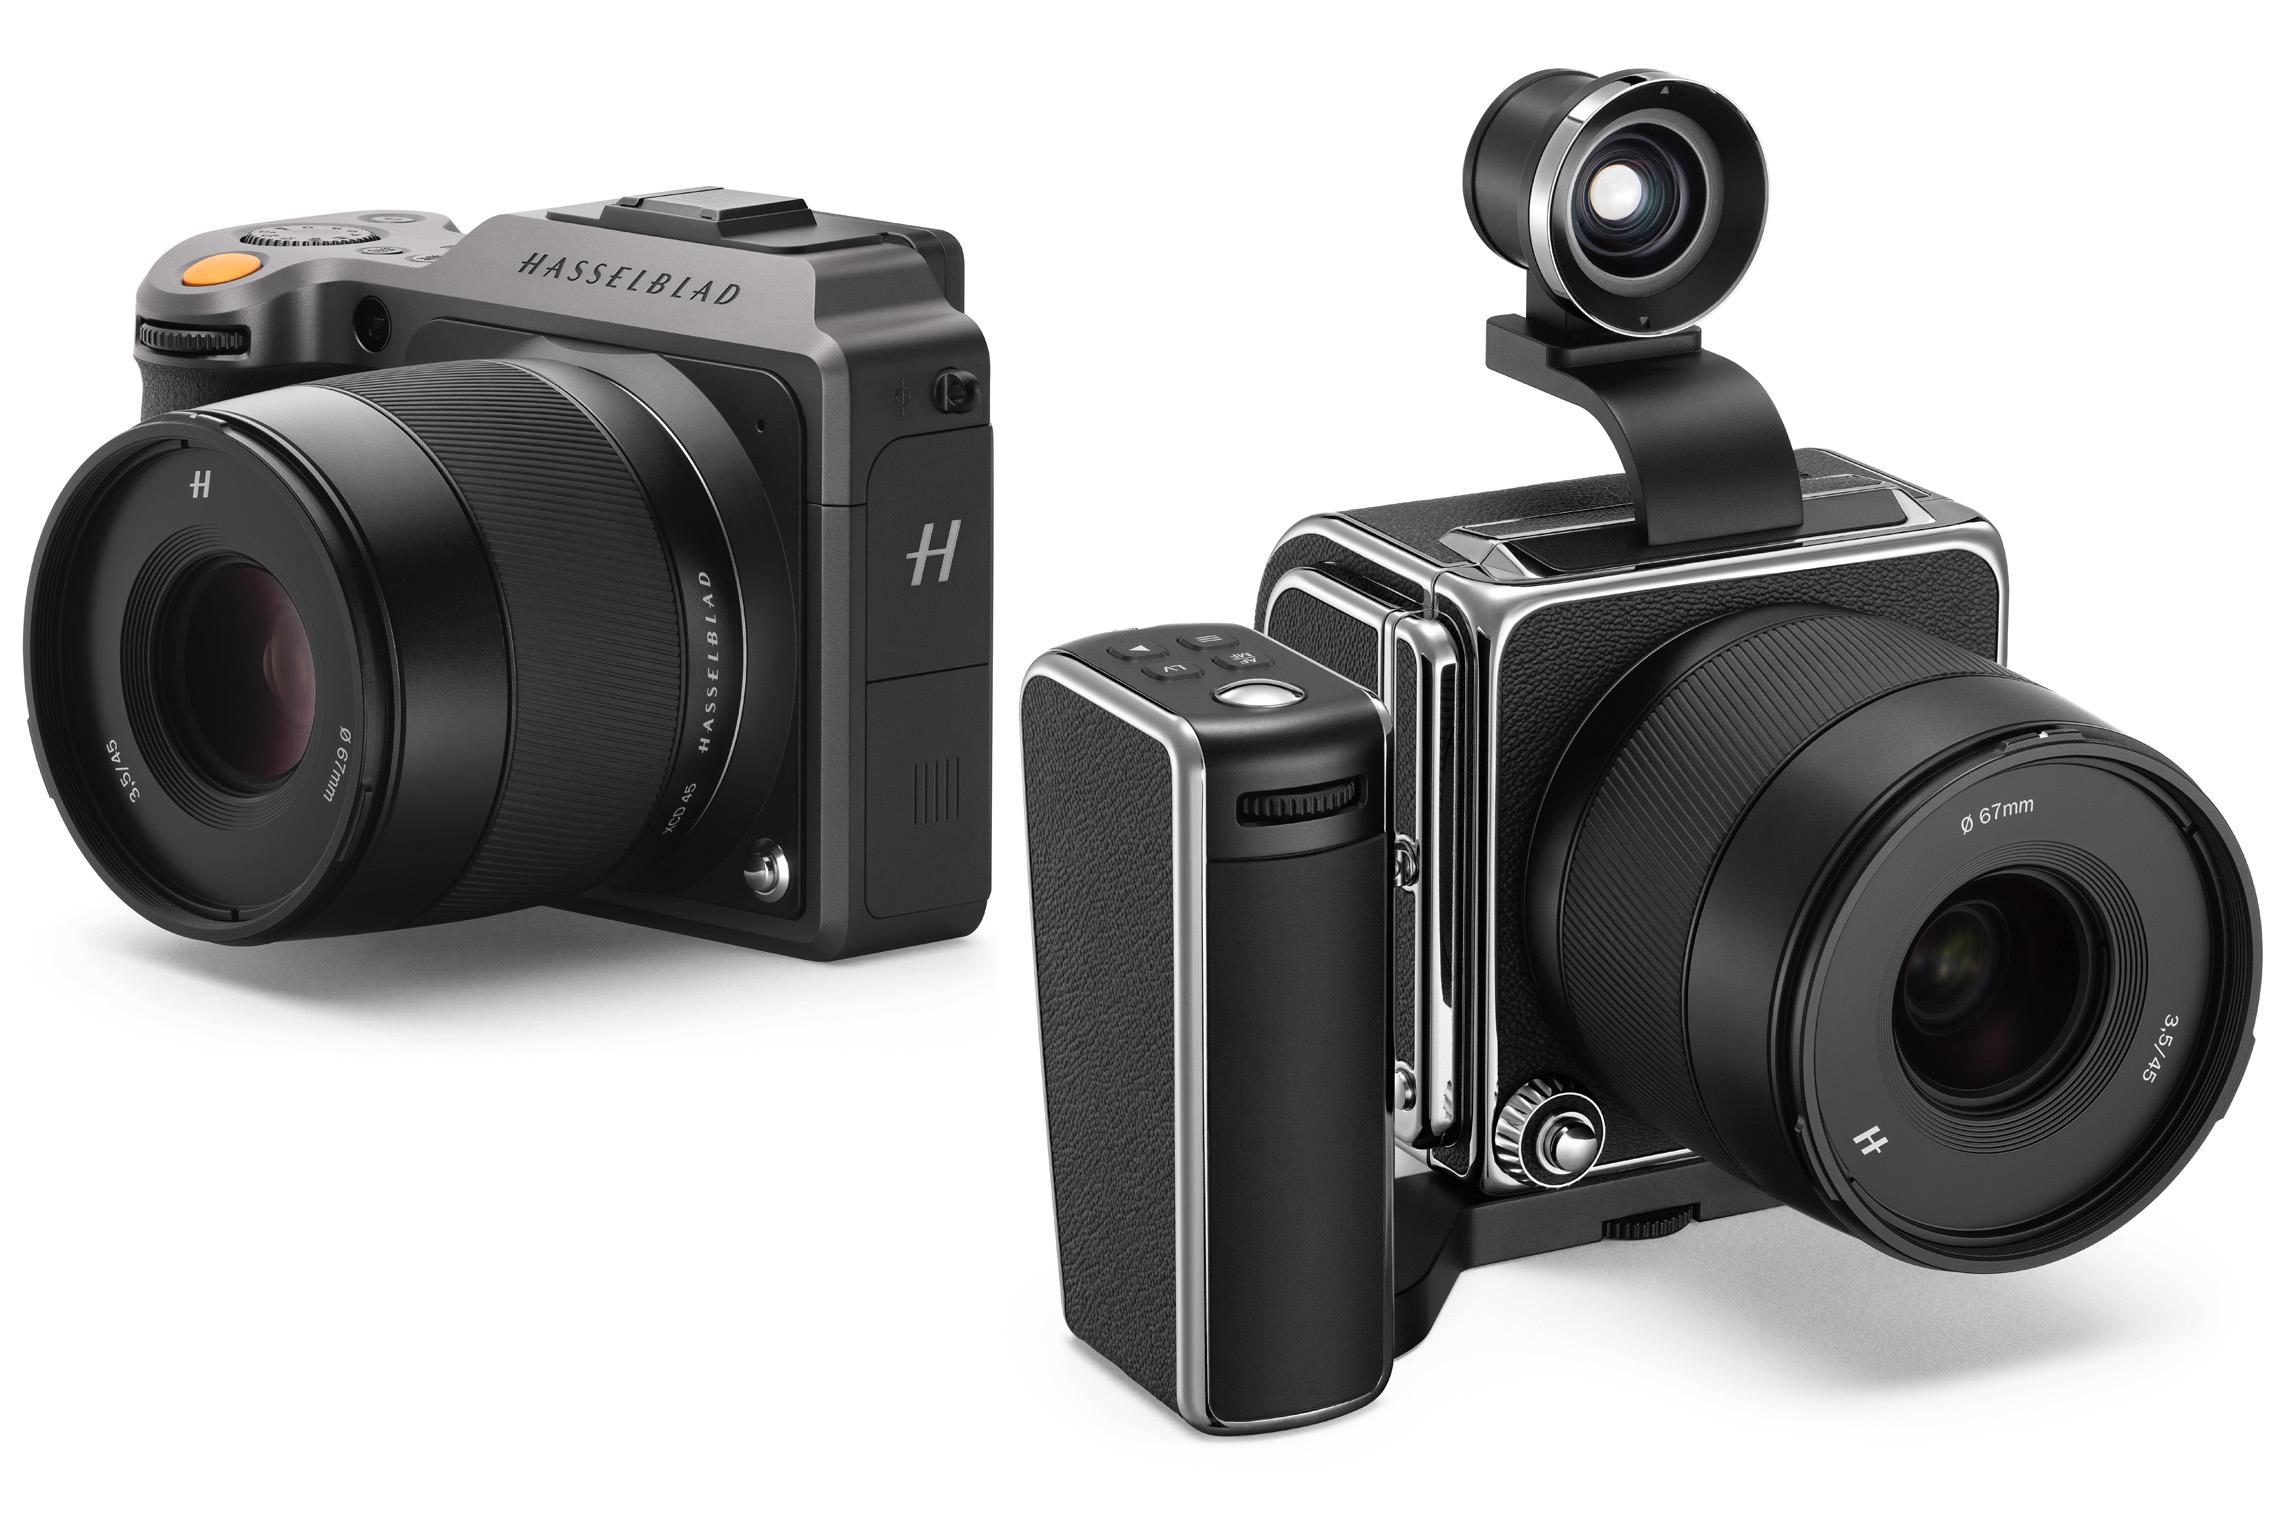 Två spegelfria kameror från Hasselblad